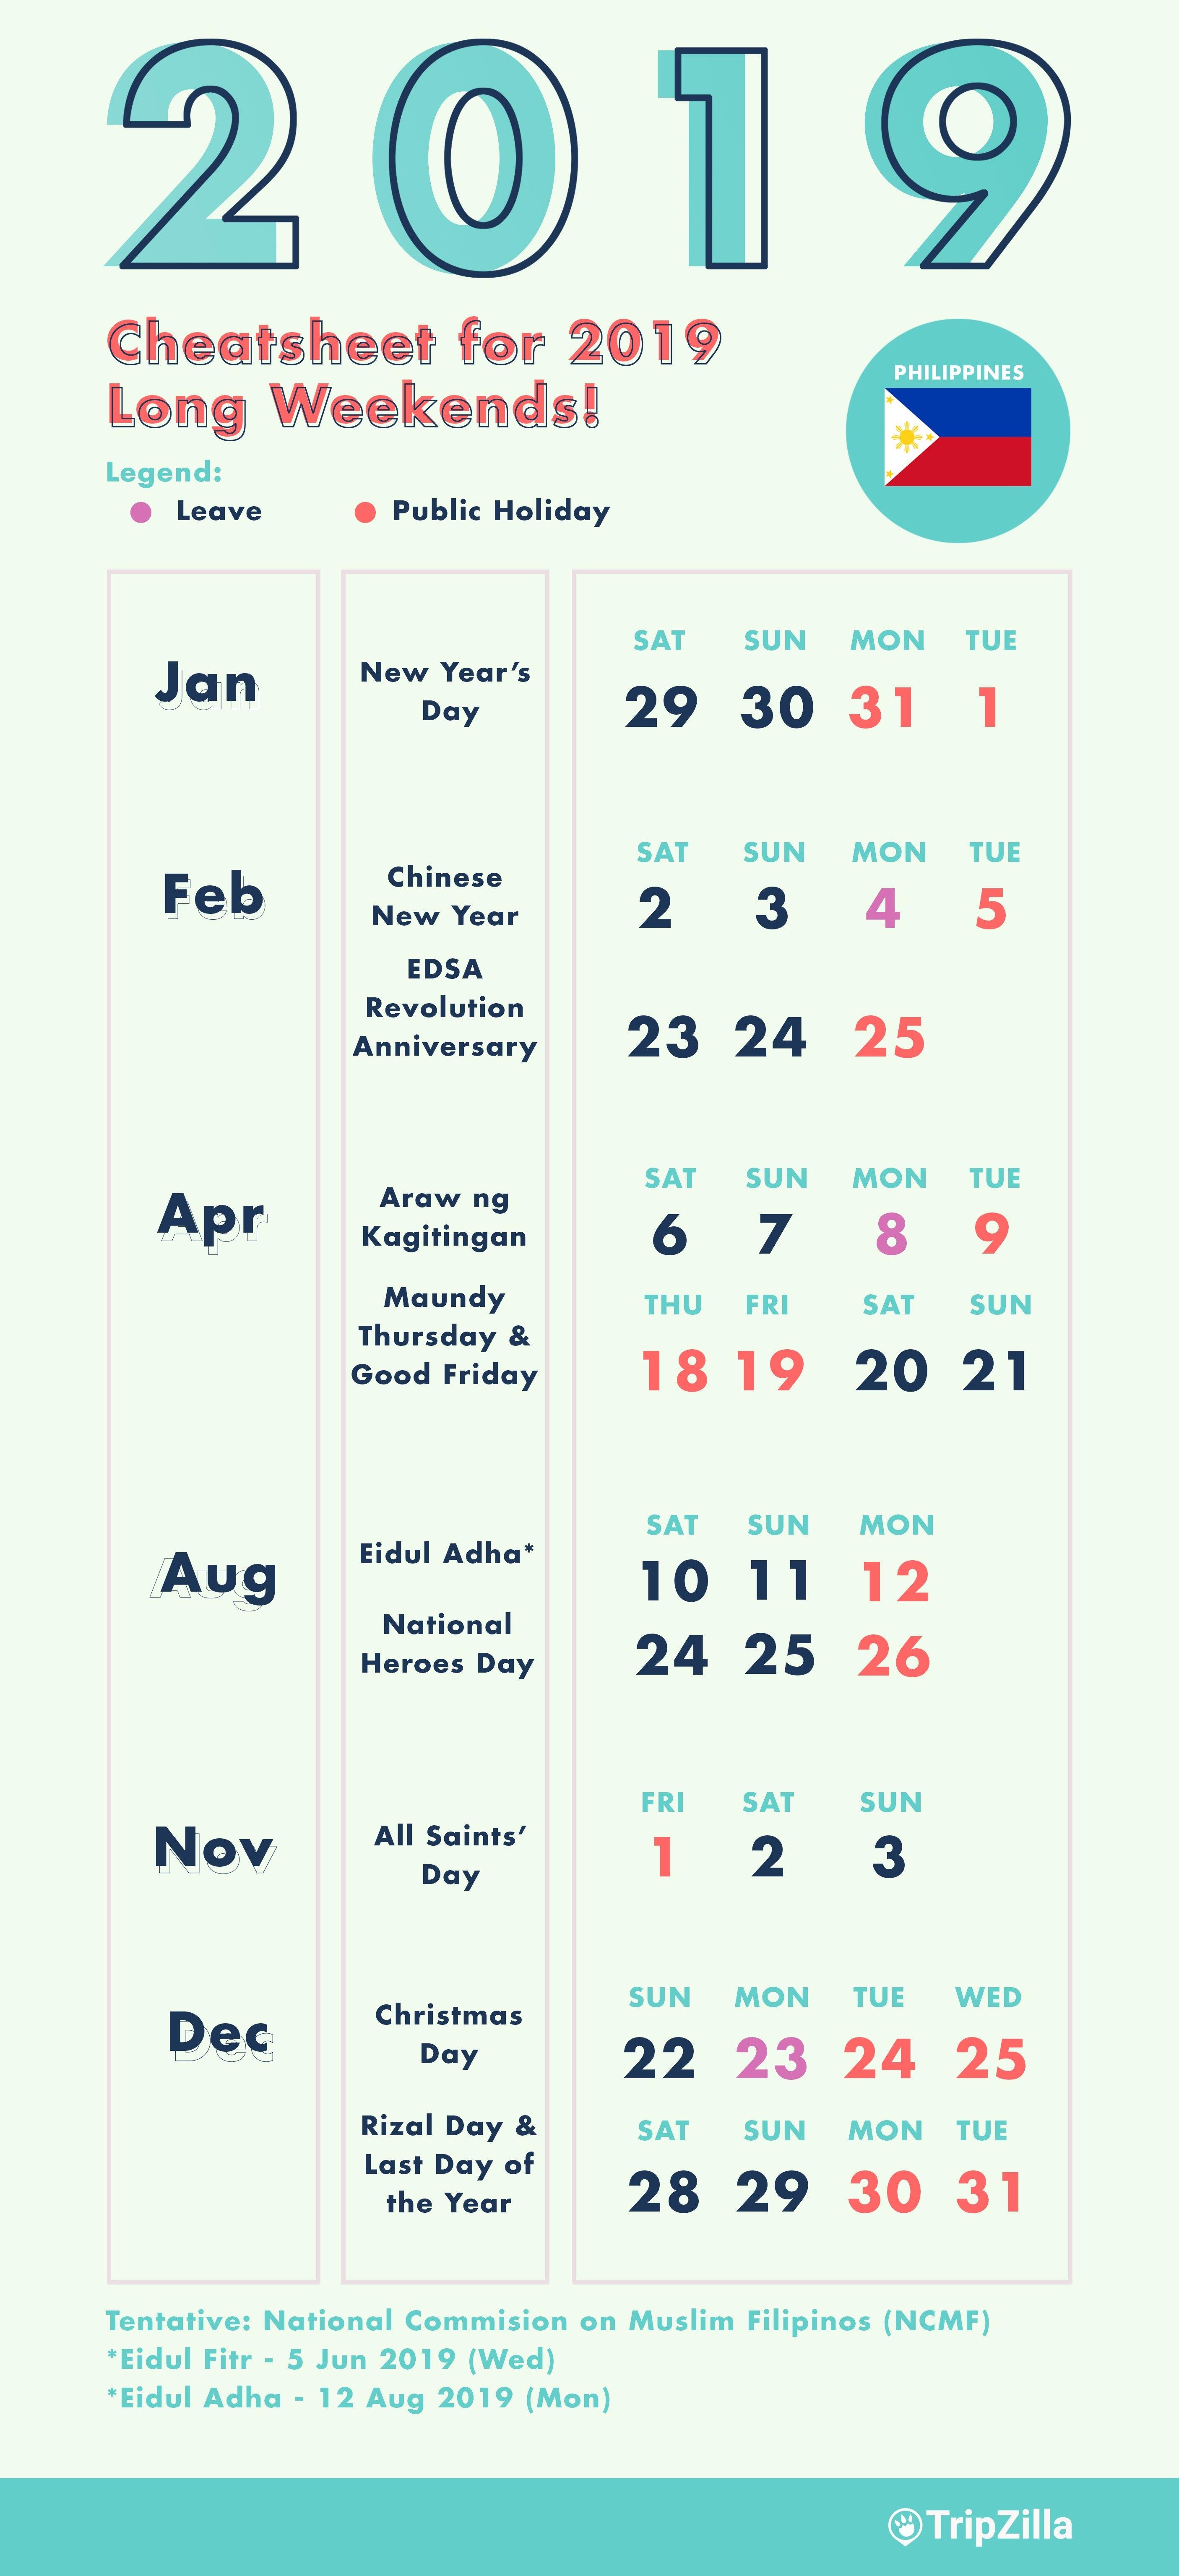 10 Long Weekends In The Philippines In 2019 With Calendar & Cheatsheet Calendar 2019 Leave